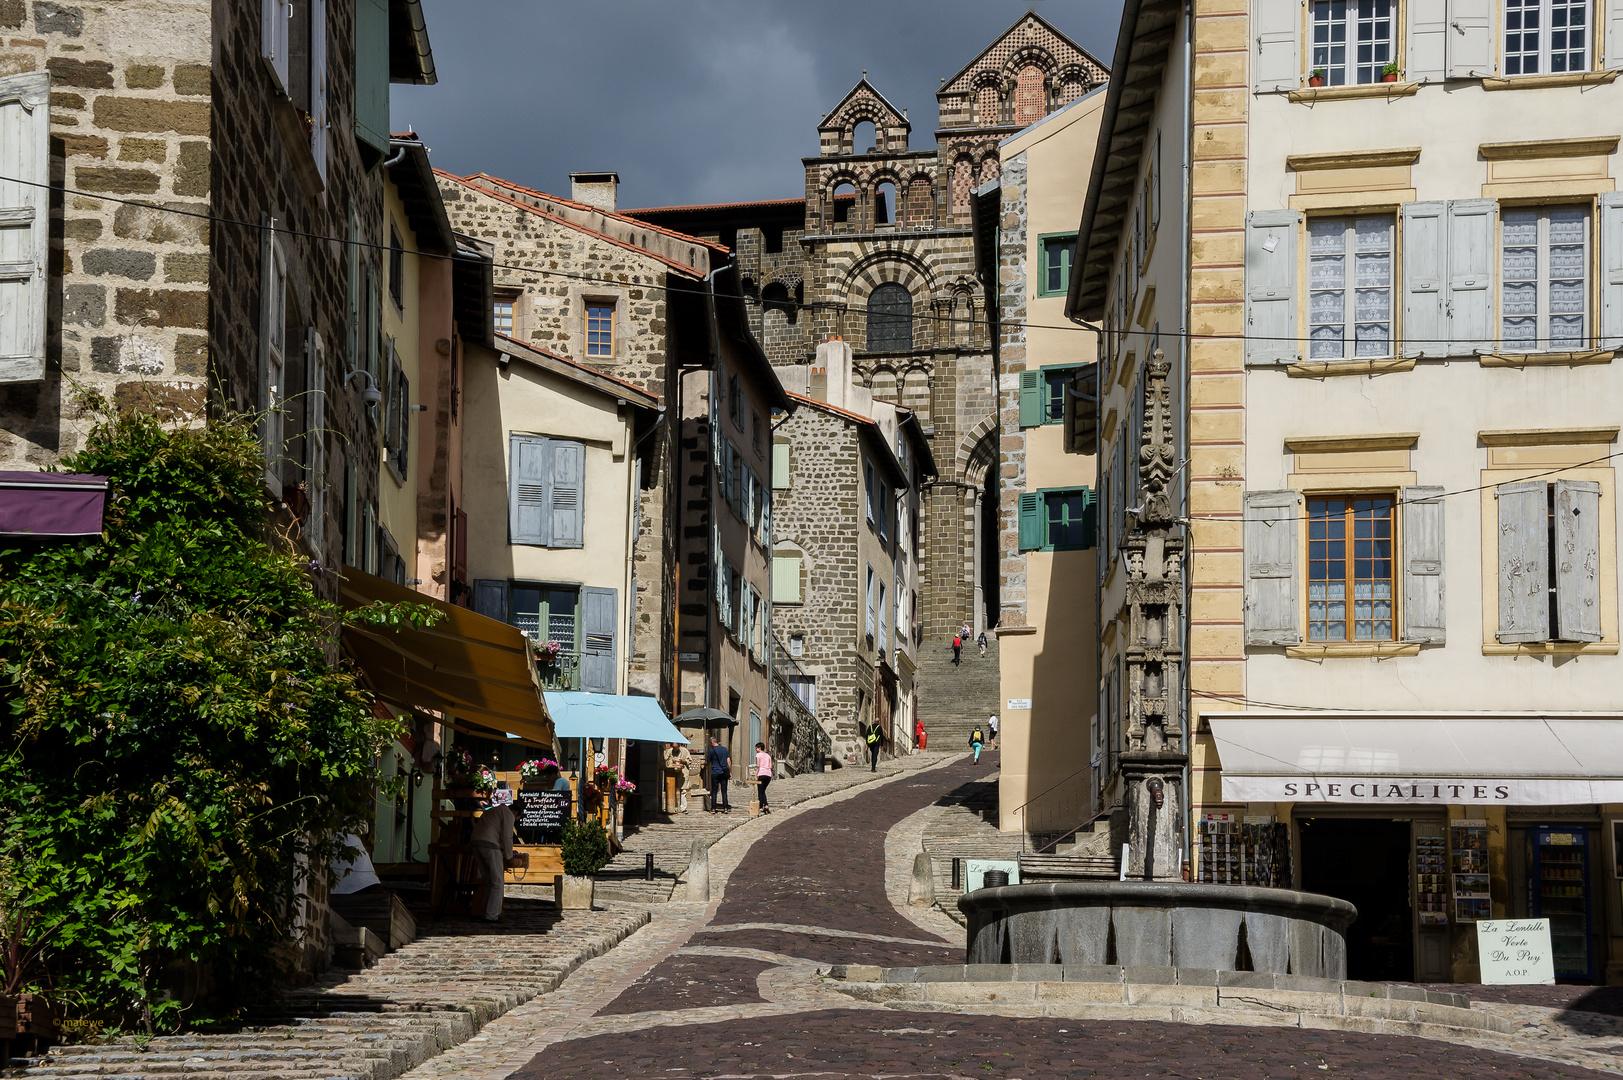 Le Puy en Velay - Kathedralbezirk